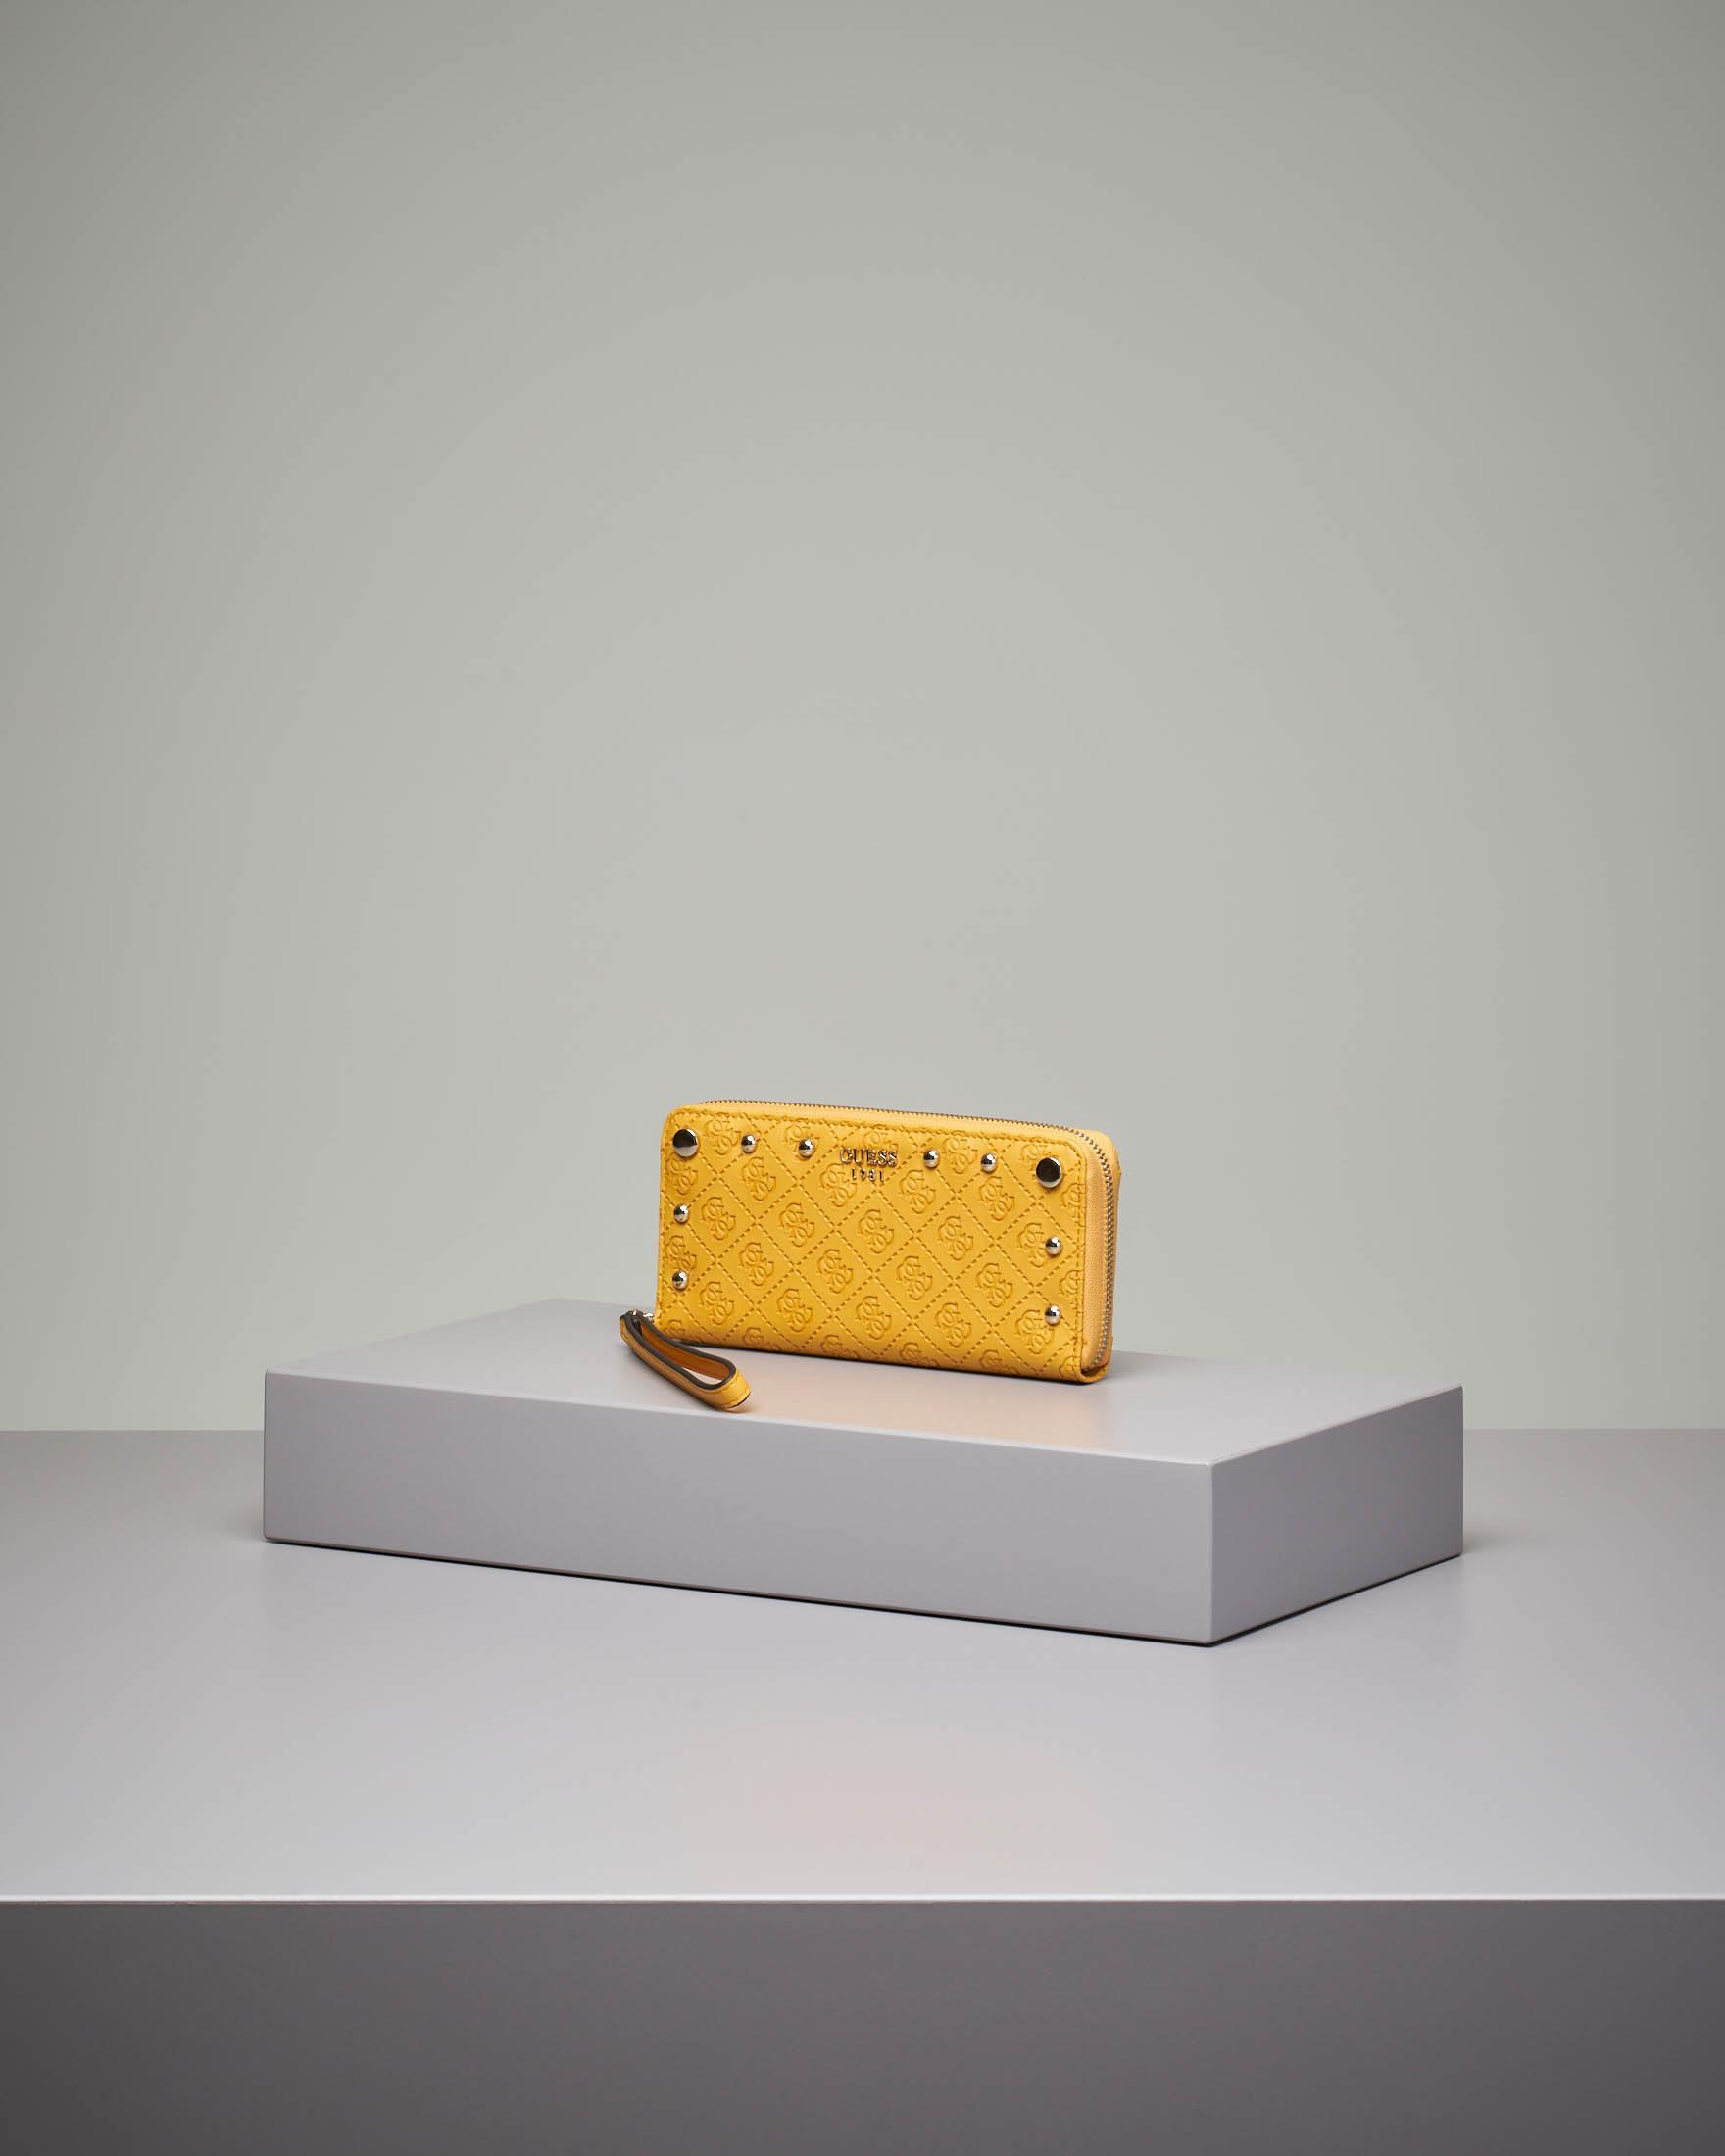 Portafoglio giallo grande con chiusura a cerniera fantasia a logo